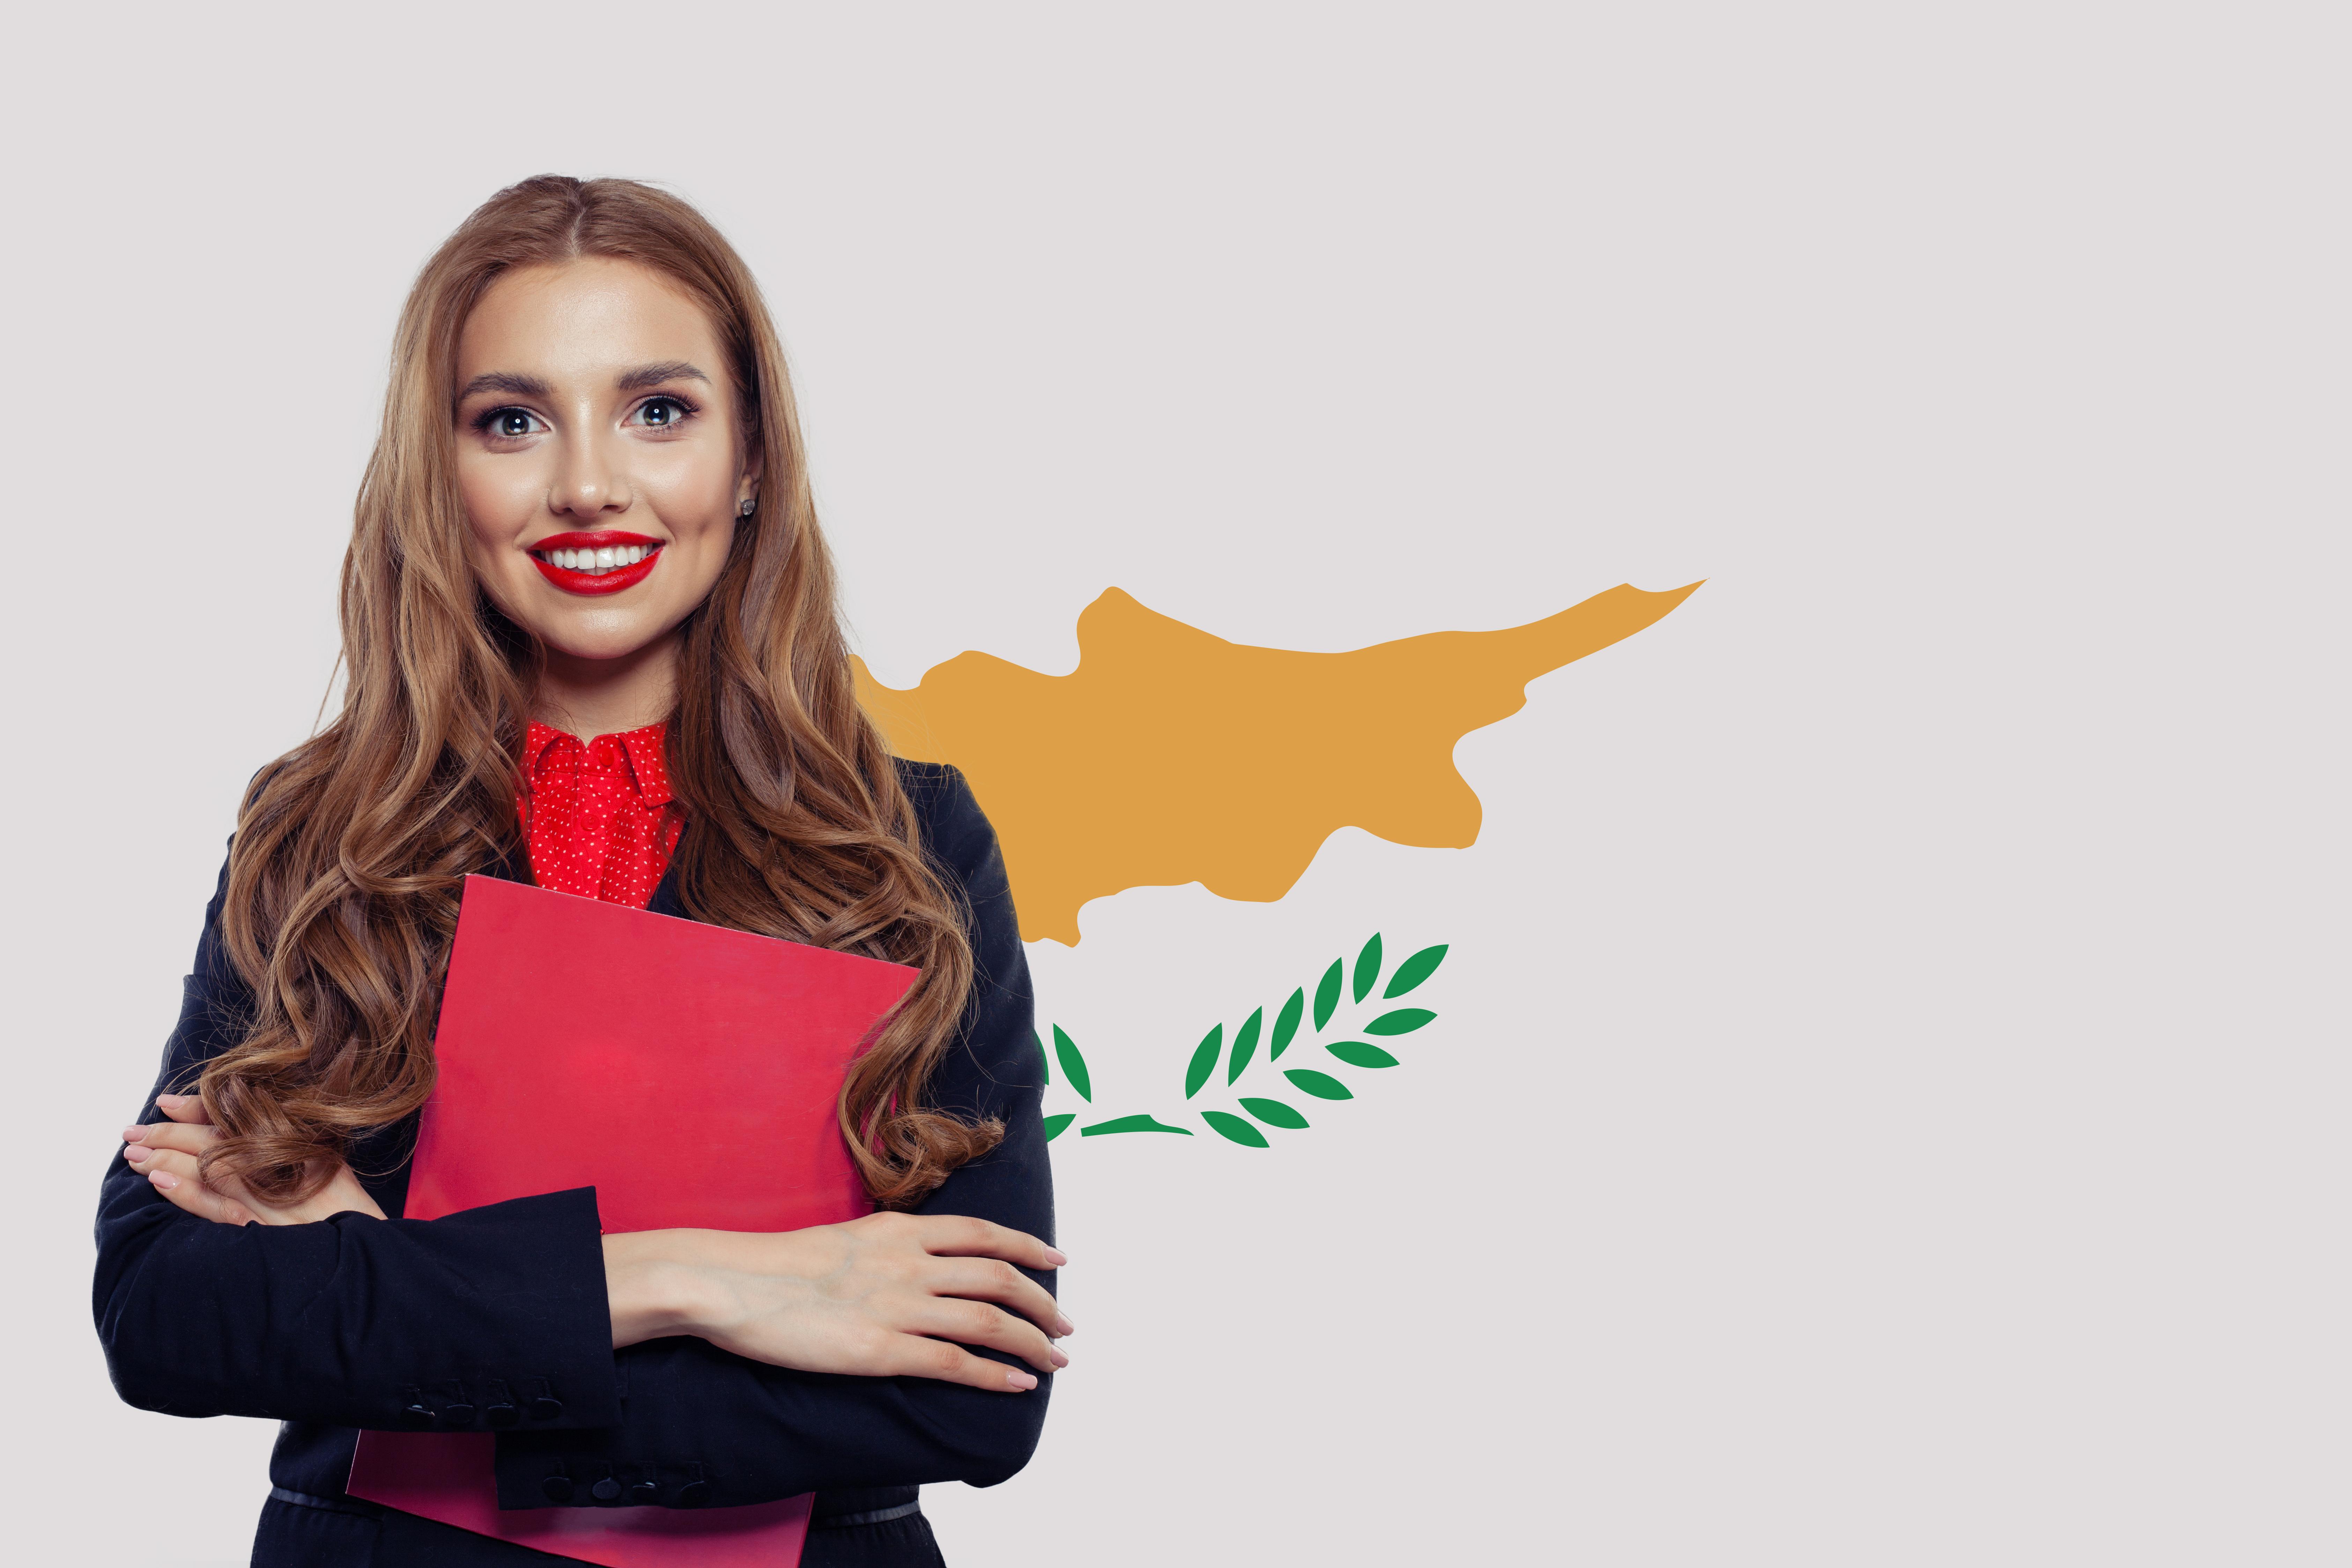 Студентка на фоне флага Кипра, страны, куда могут уехать на учебу иностранцы